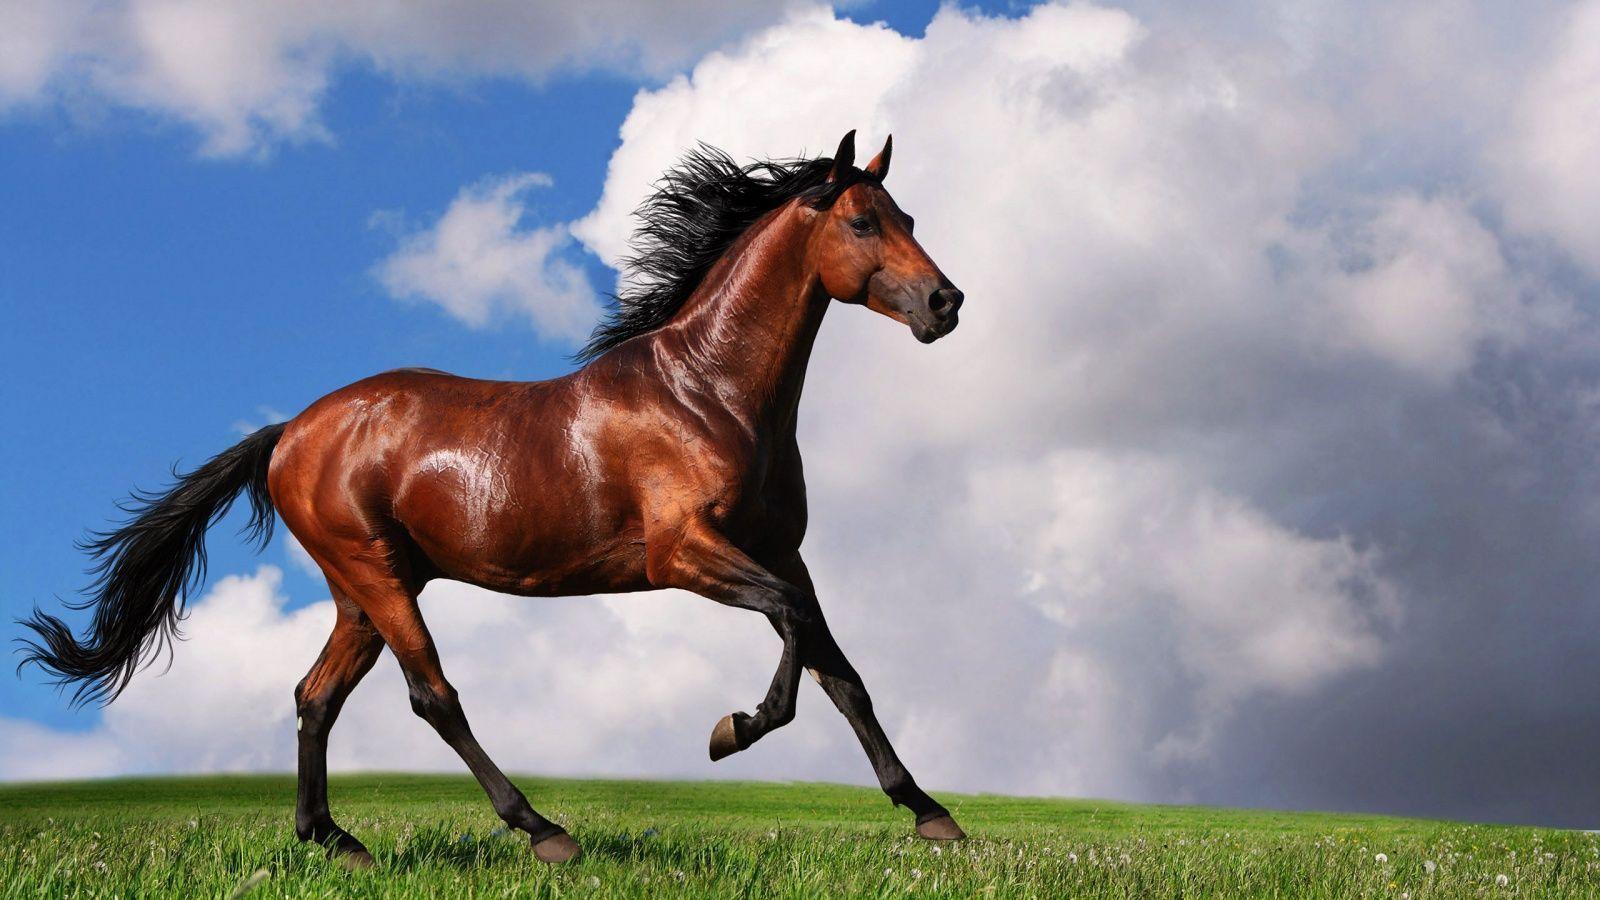 Simple Wallpaper Horse Epic - 21e73934f29331ad4123365180a236ed  Graphic_355749.jpg